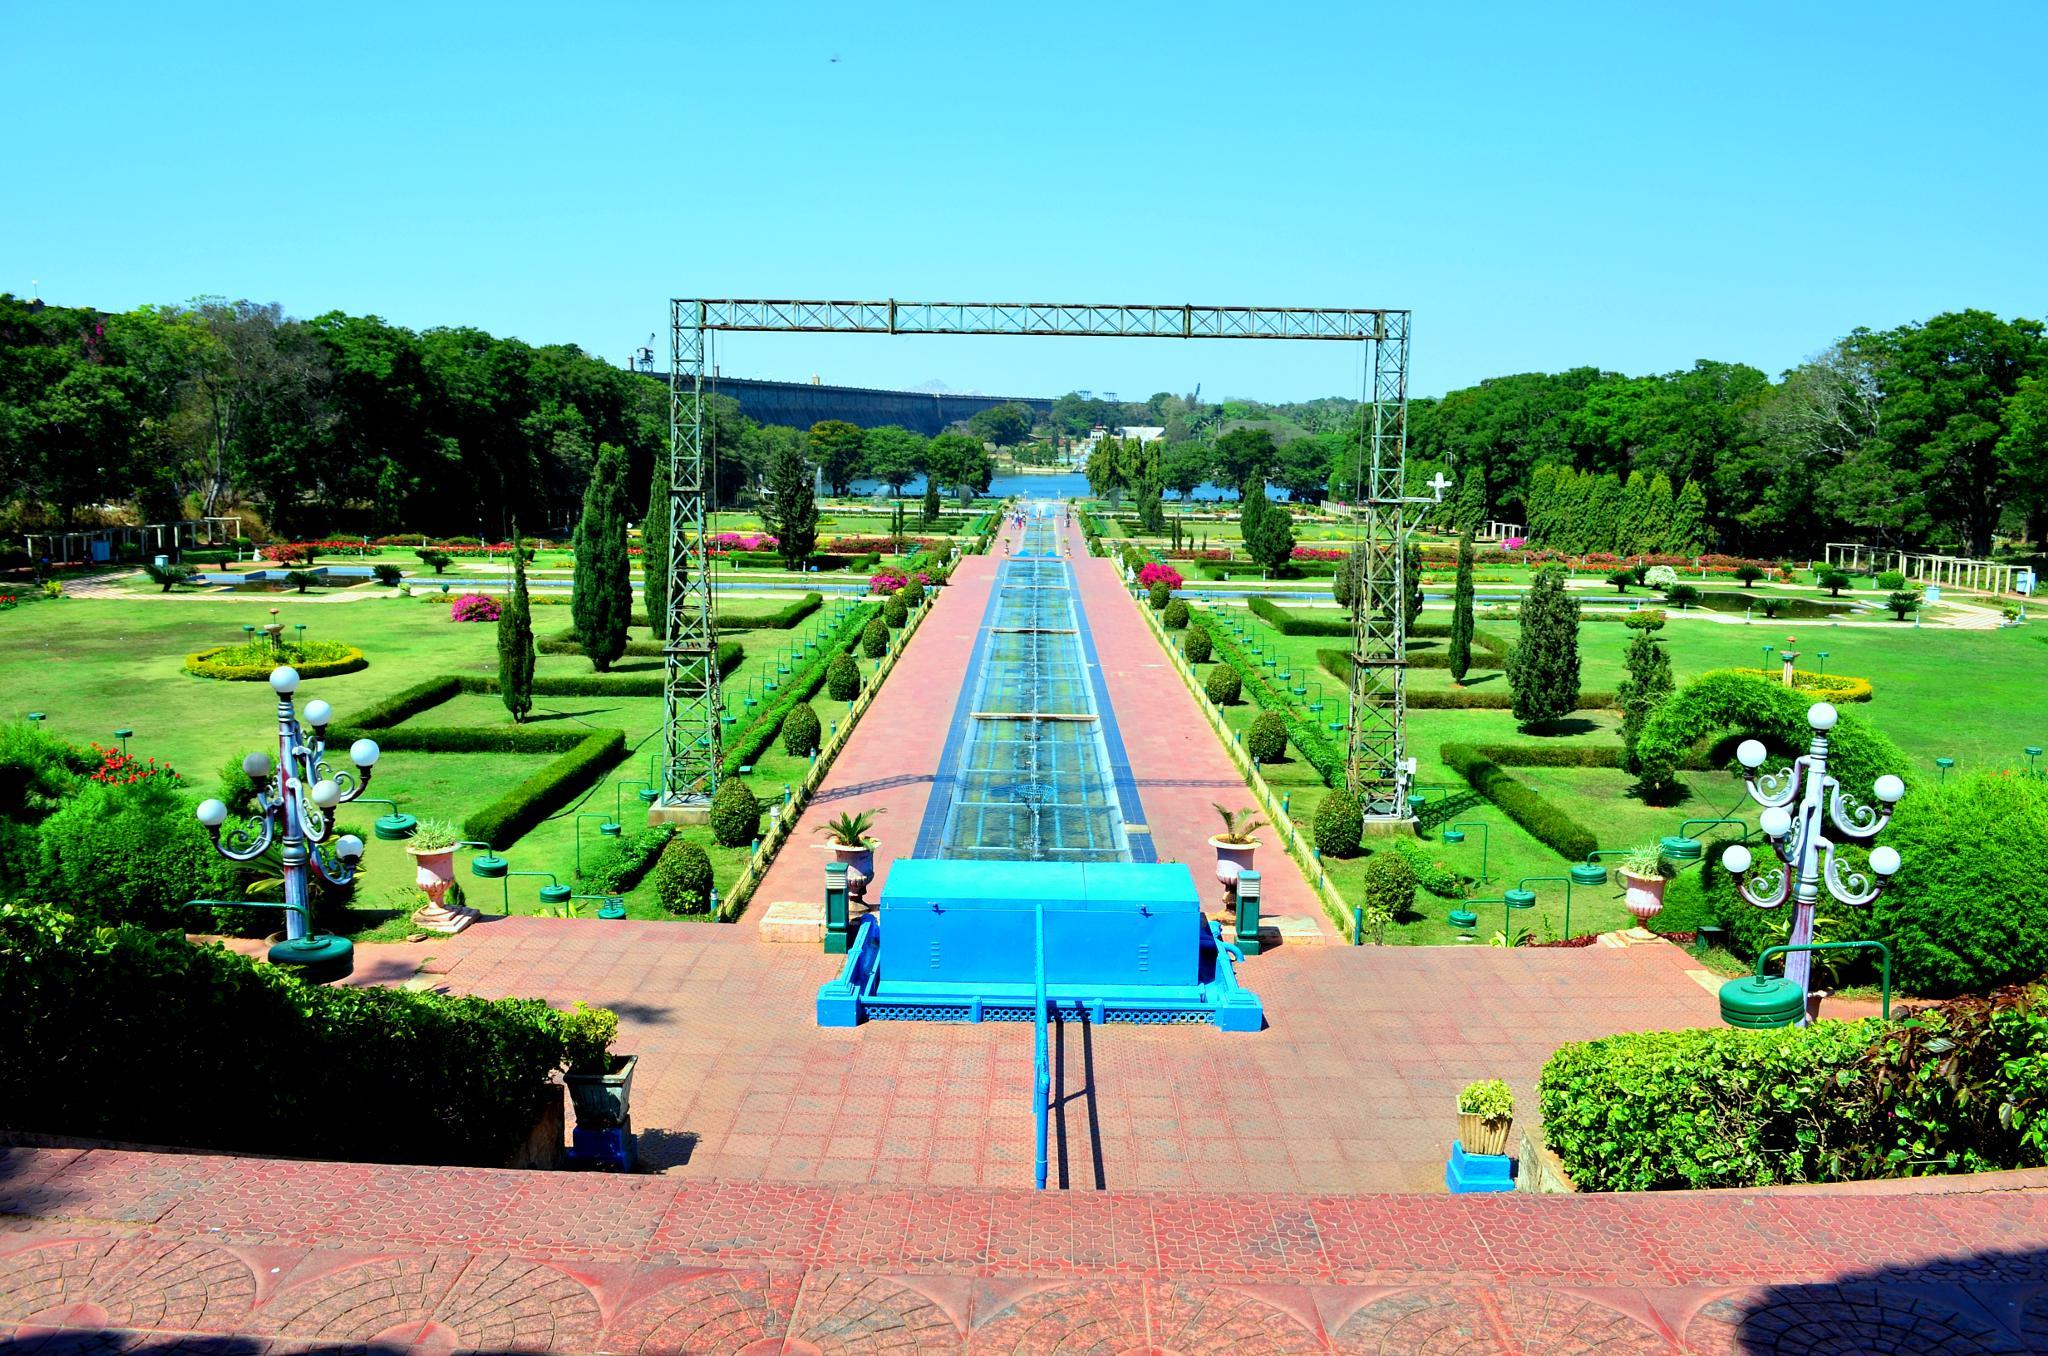 Myzore Brindaban Garden by Syam M S